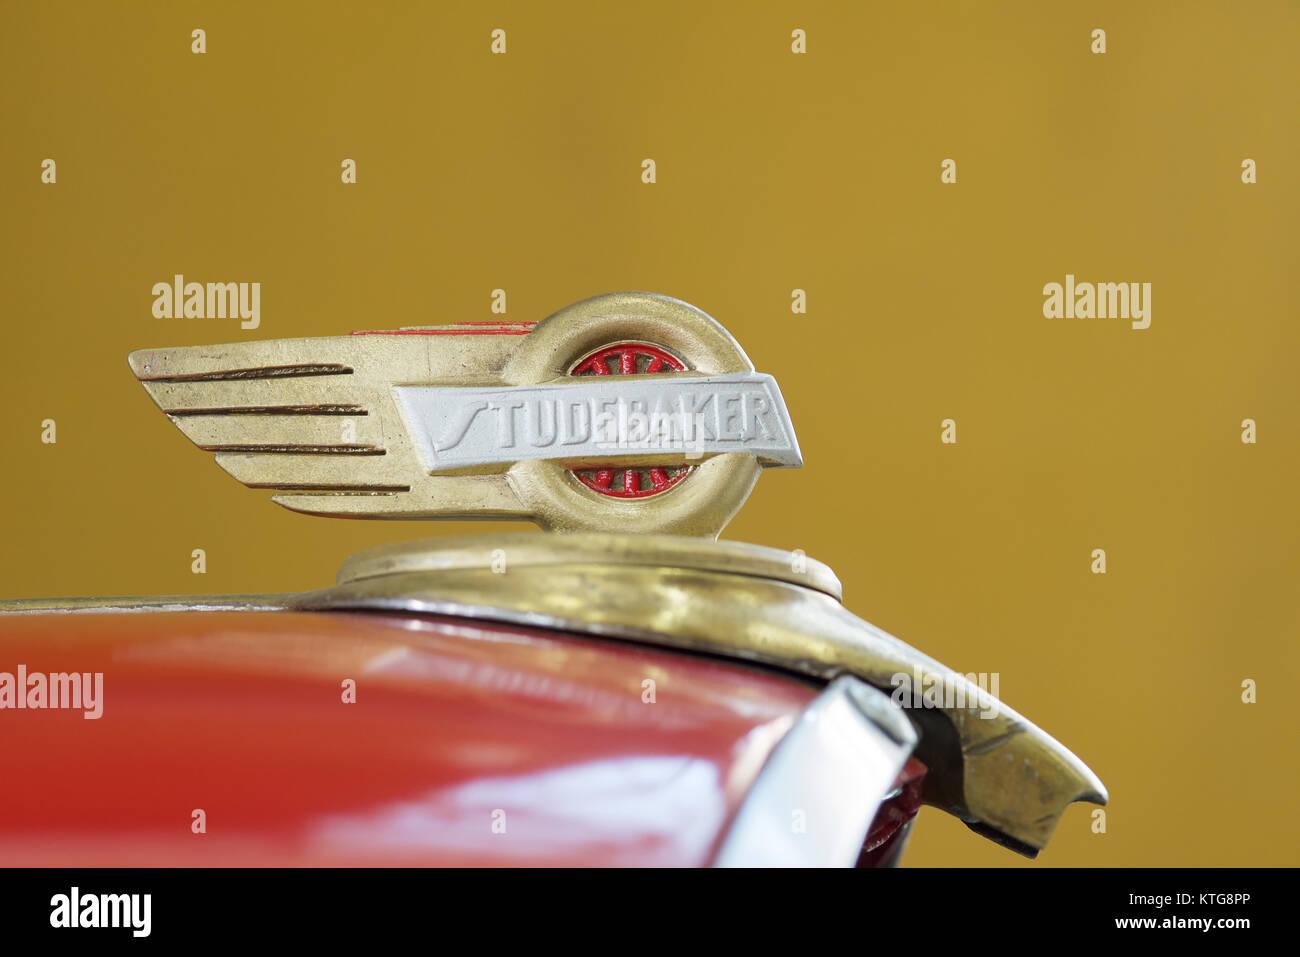 Classic Car detail of badge - Studebaker - Stock Image